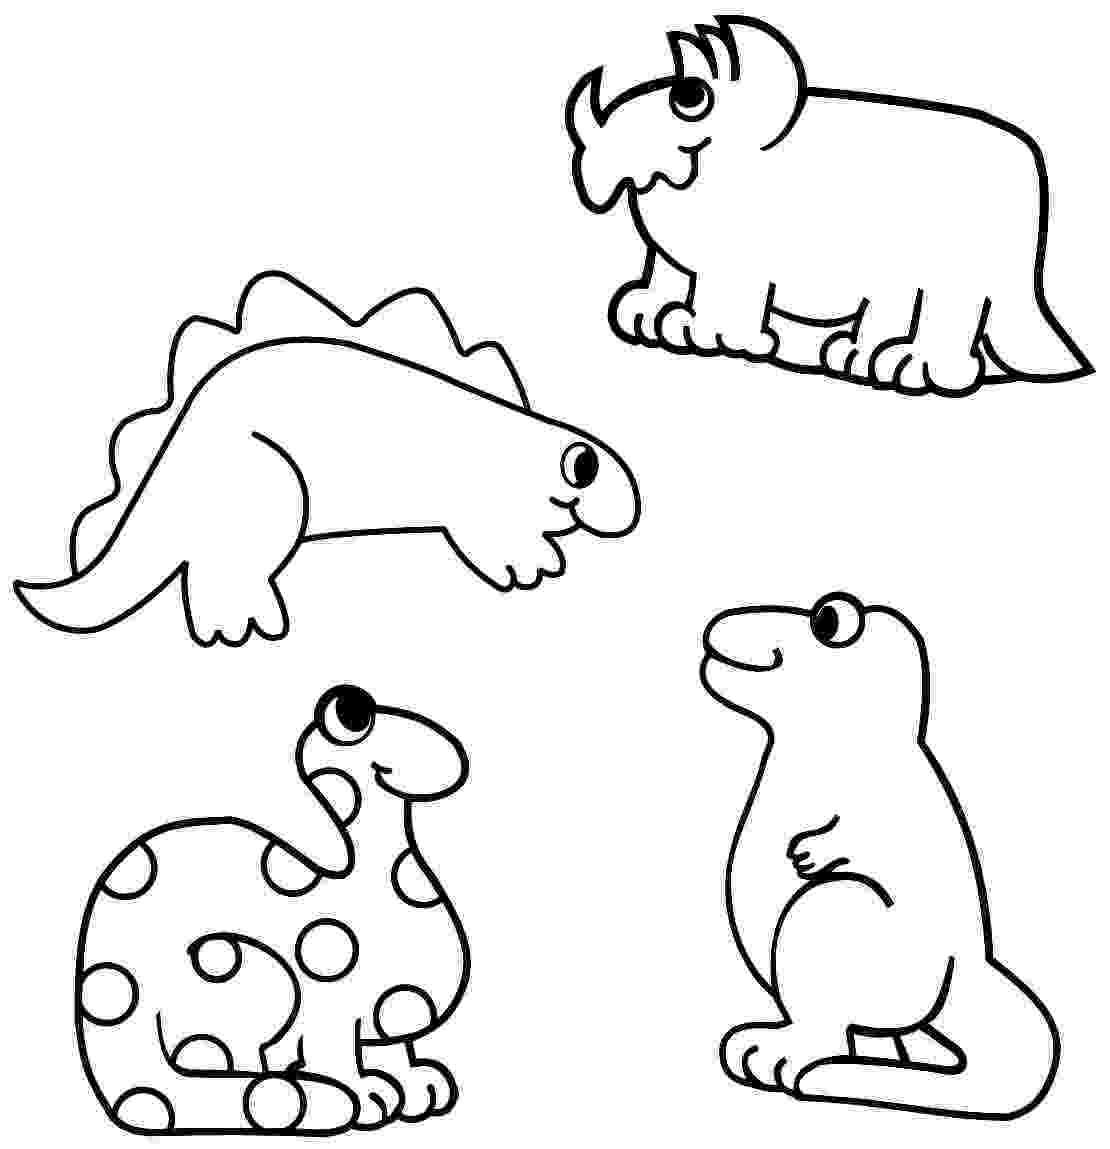 dinosaur coloring sheets preschool dinosaurs coloring pages collection free coloring sheets dinosaur coloring sheets preschool